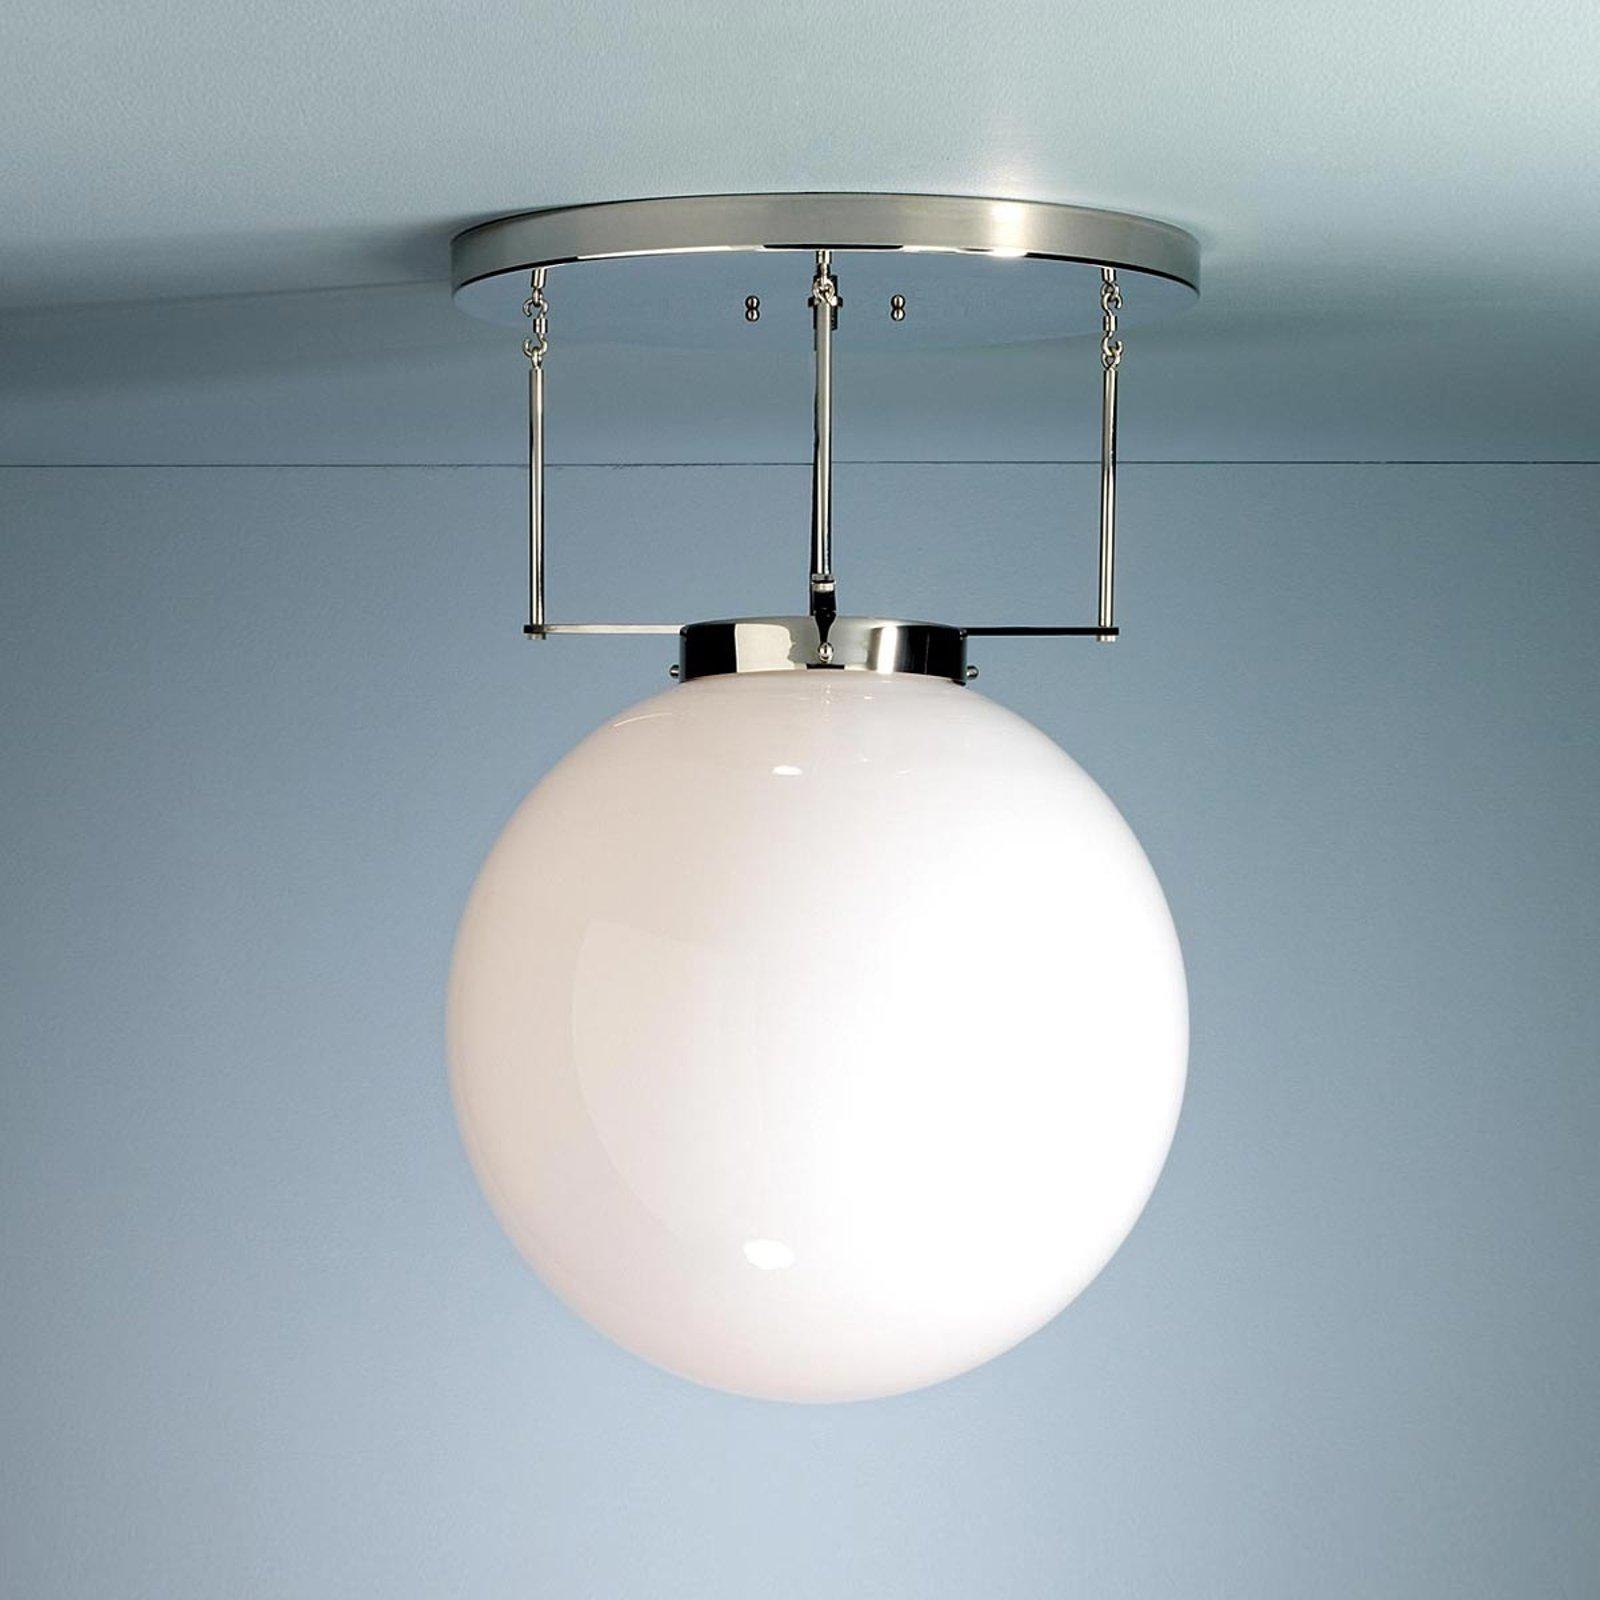 Brandts taklampe i Bauhaus-stil nikkel 35 cm